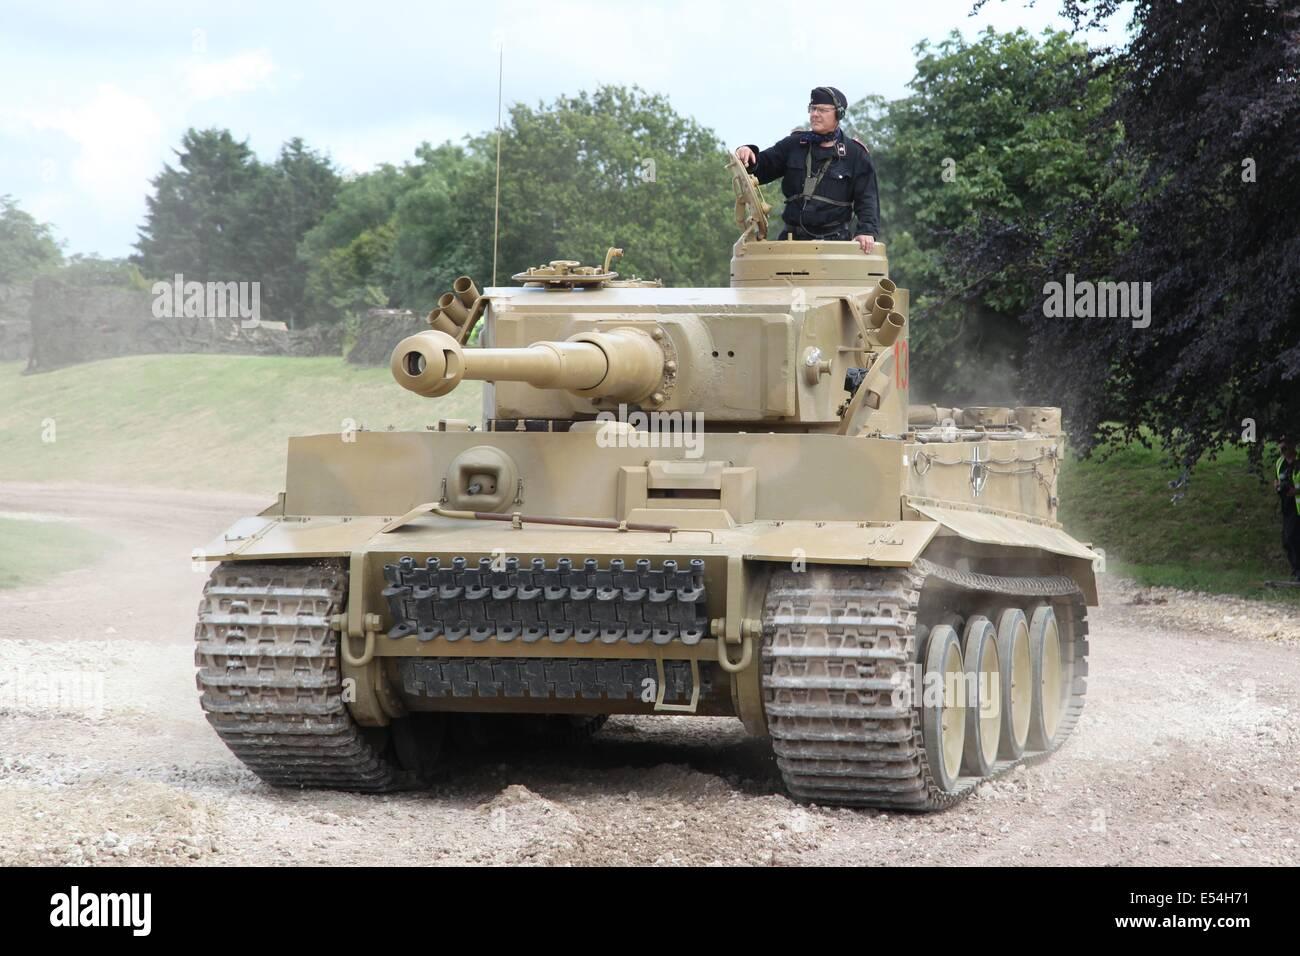 Tiger 1 Sd Kfz 181 Panzerkampfwagen Vi Ausf E Foto